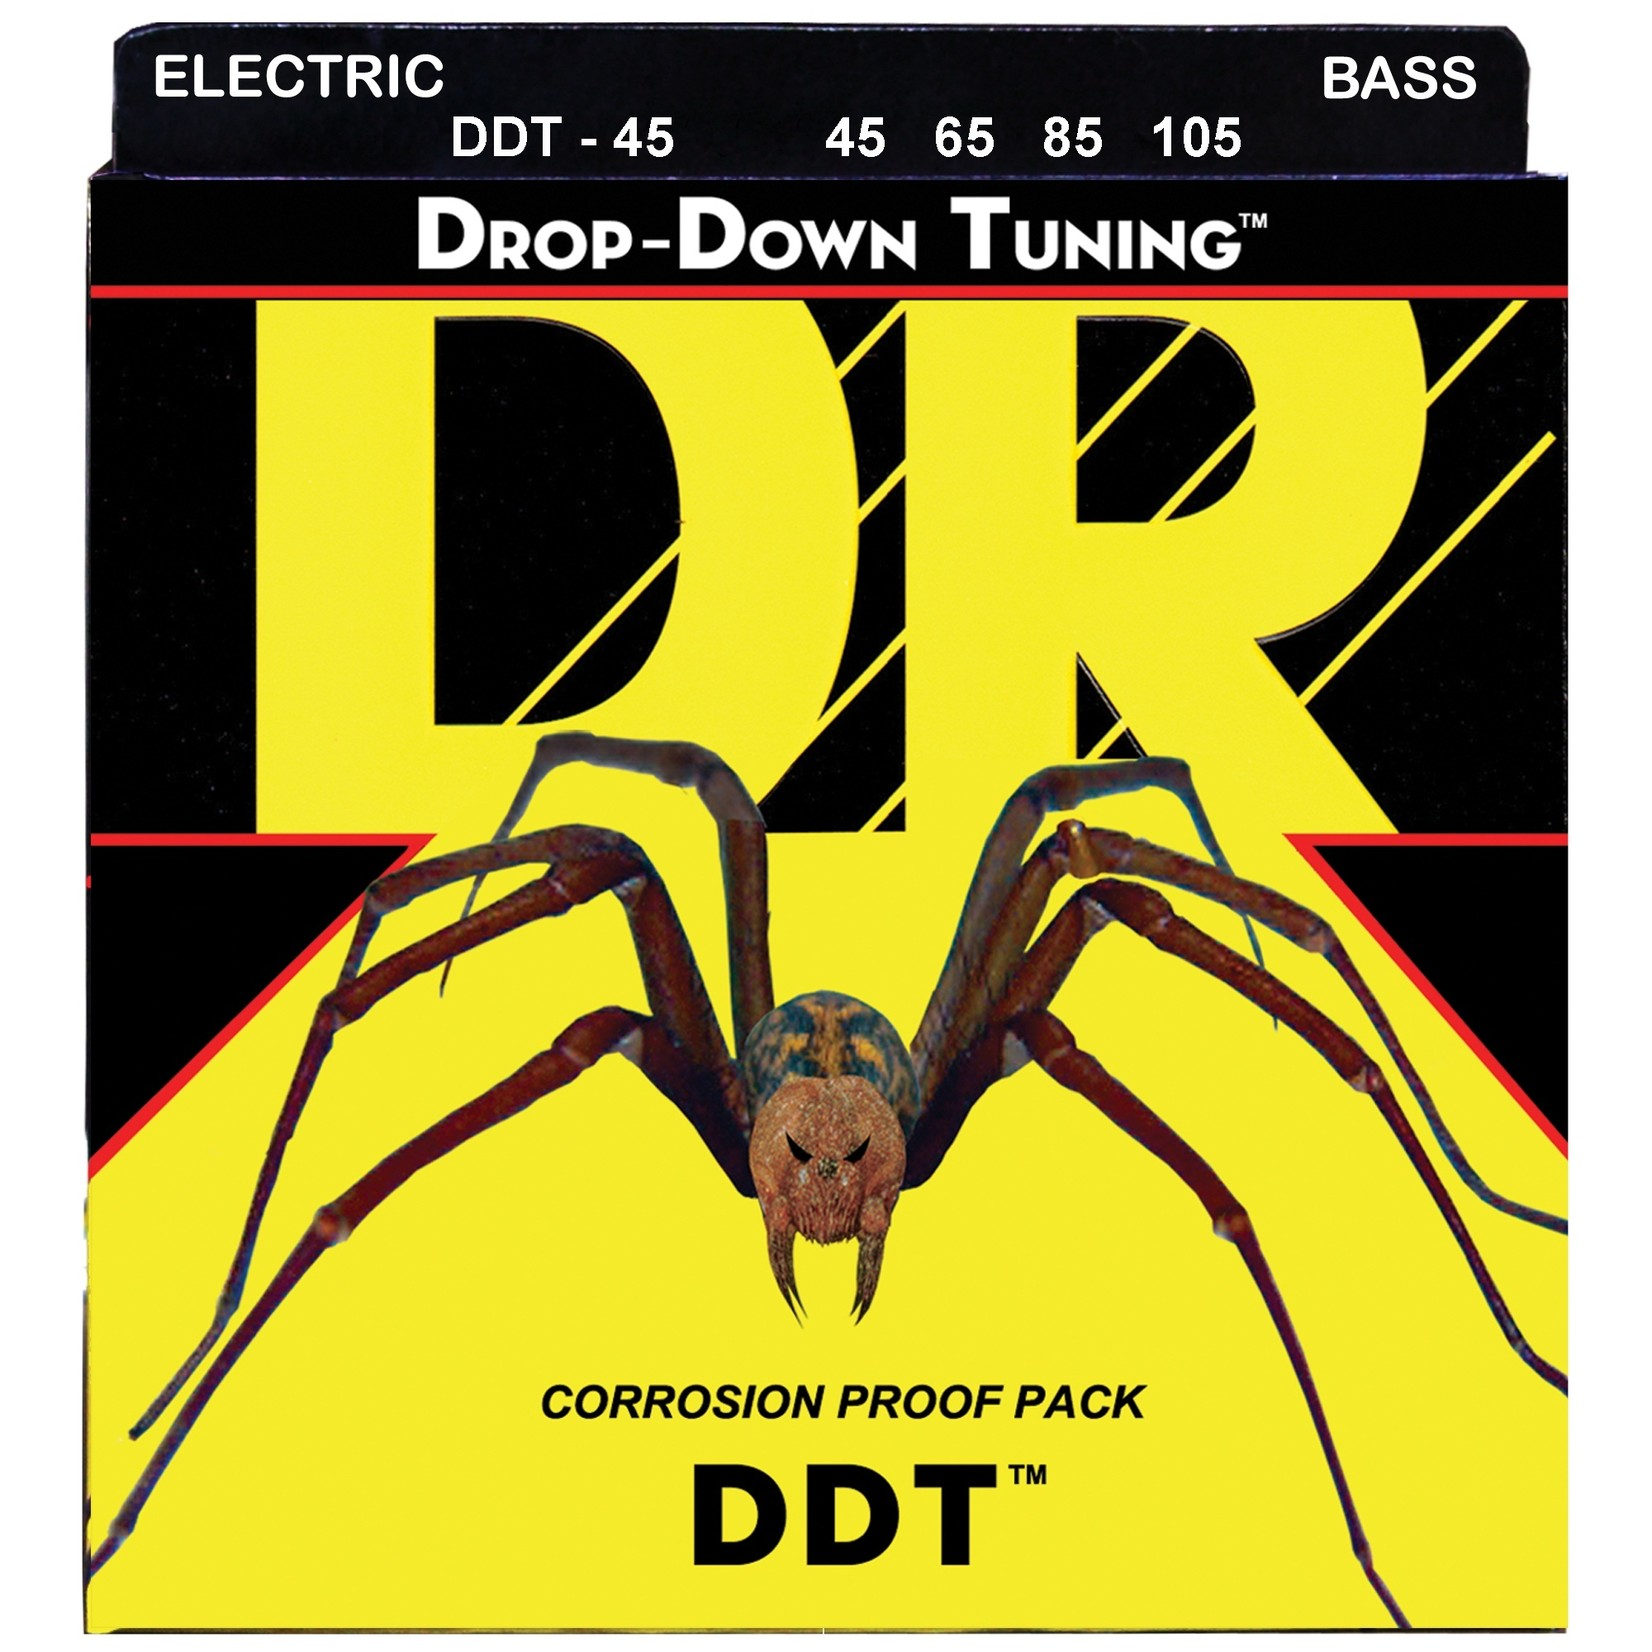 DR Strings DR Strings DDT-45 Drop-Down Tuning Bass Strings (45 65 85 105)